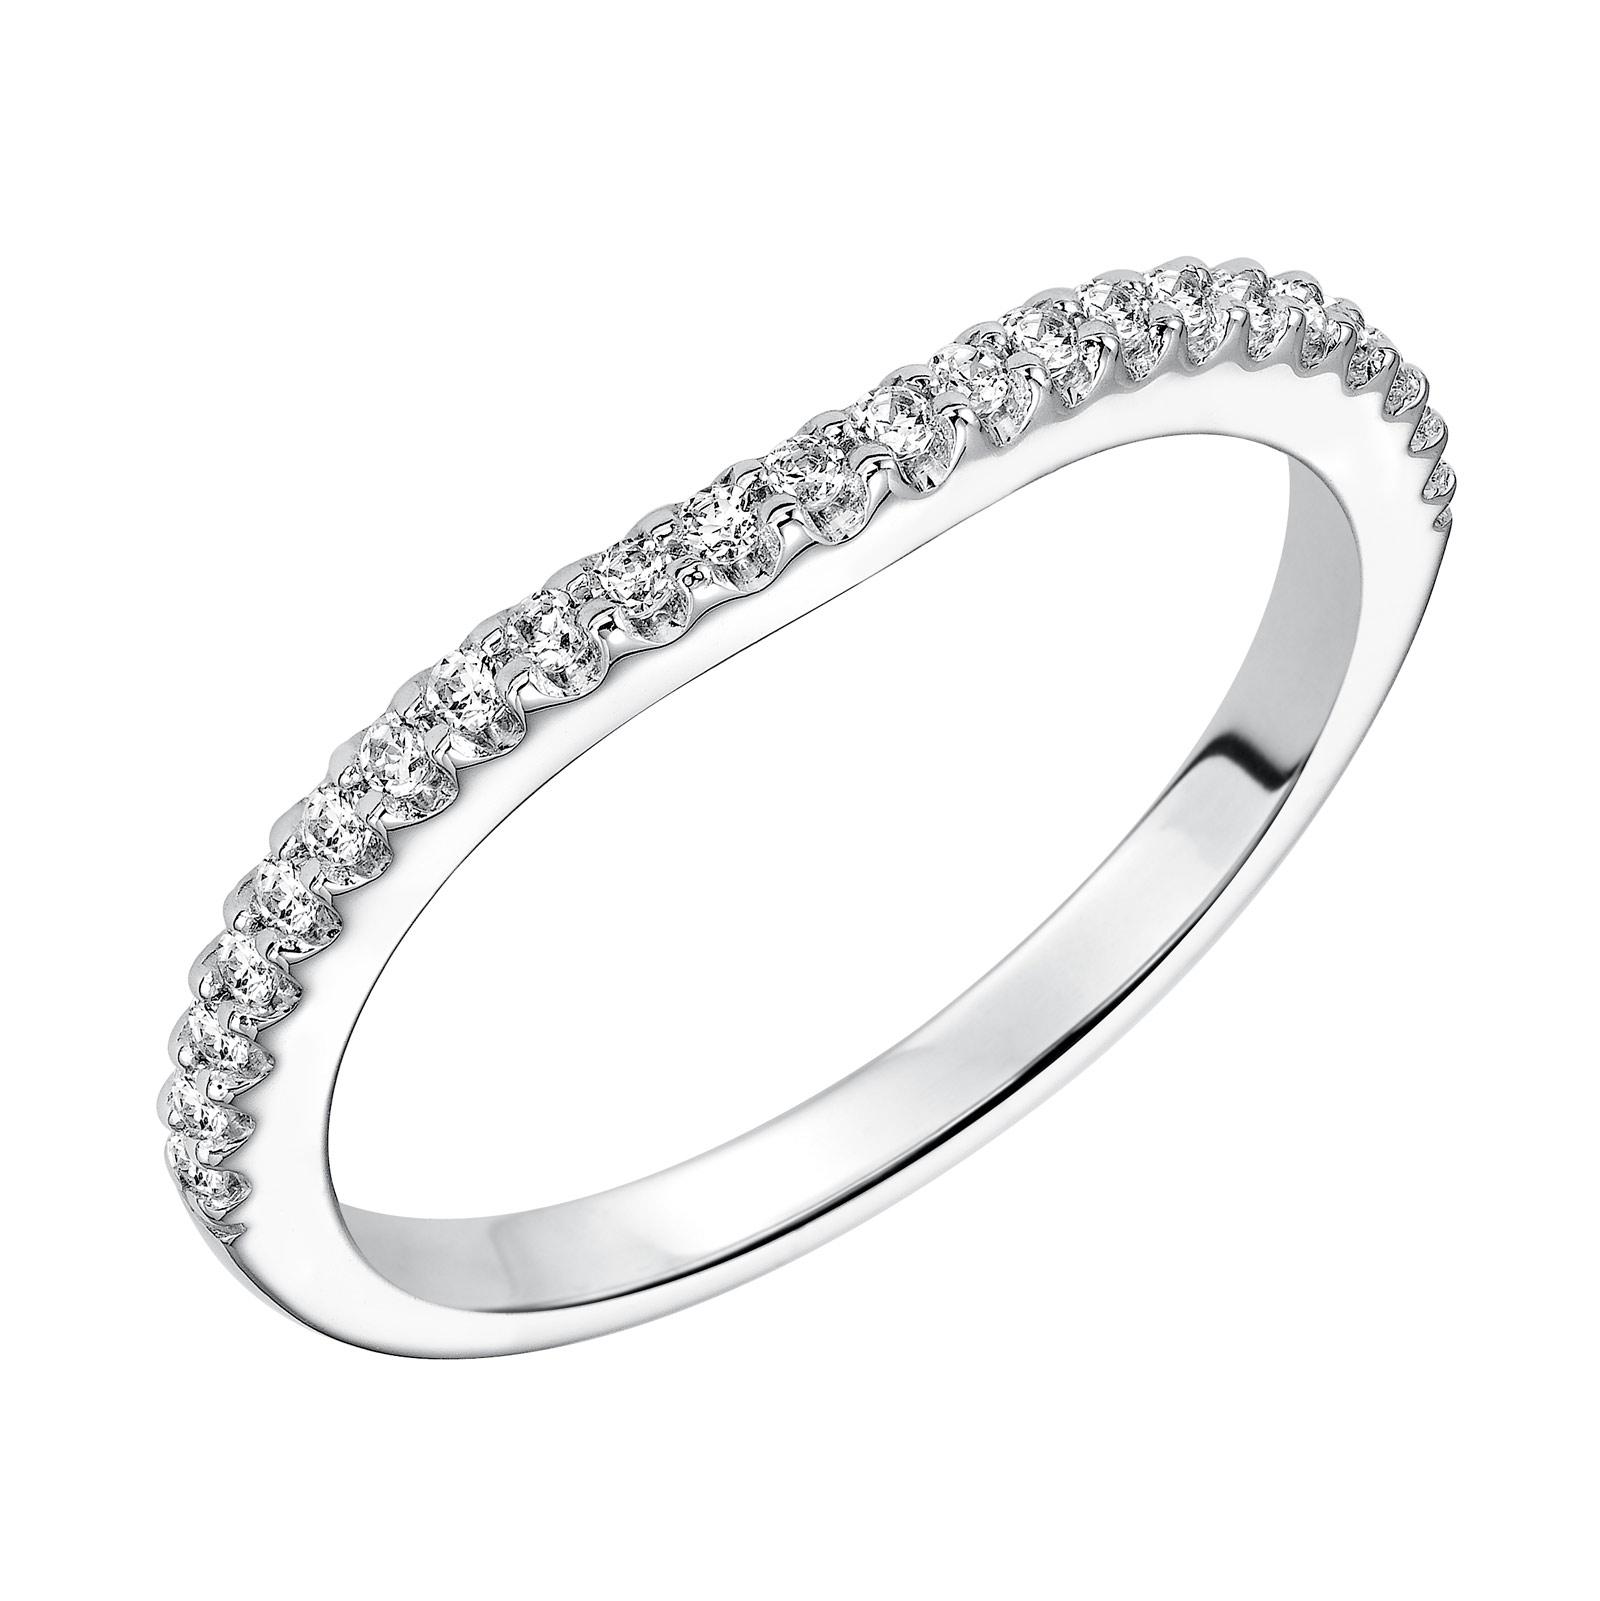 Goldman ring 31 816w l00 long island ny wedding bands for Long island wedding bands